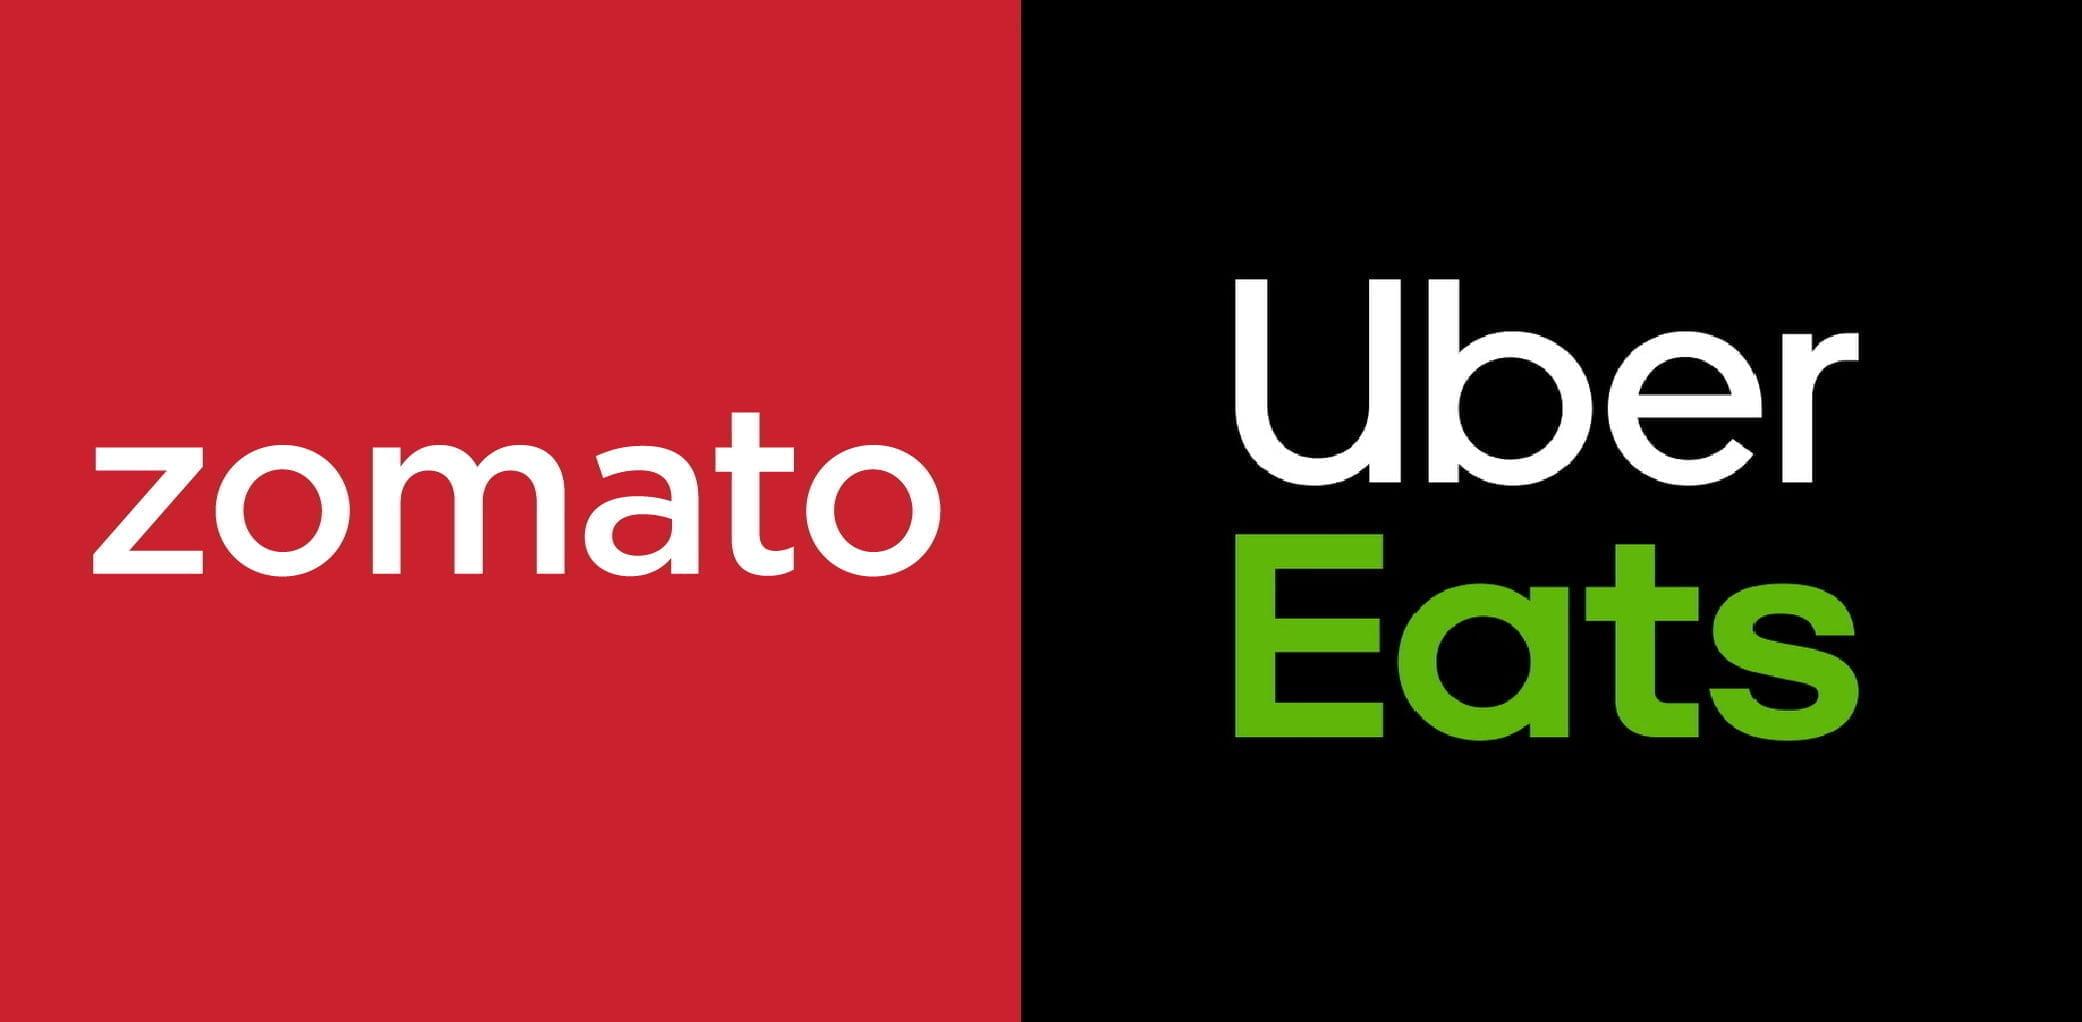 Zomato Uber Eats